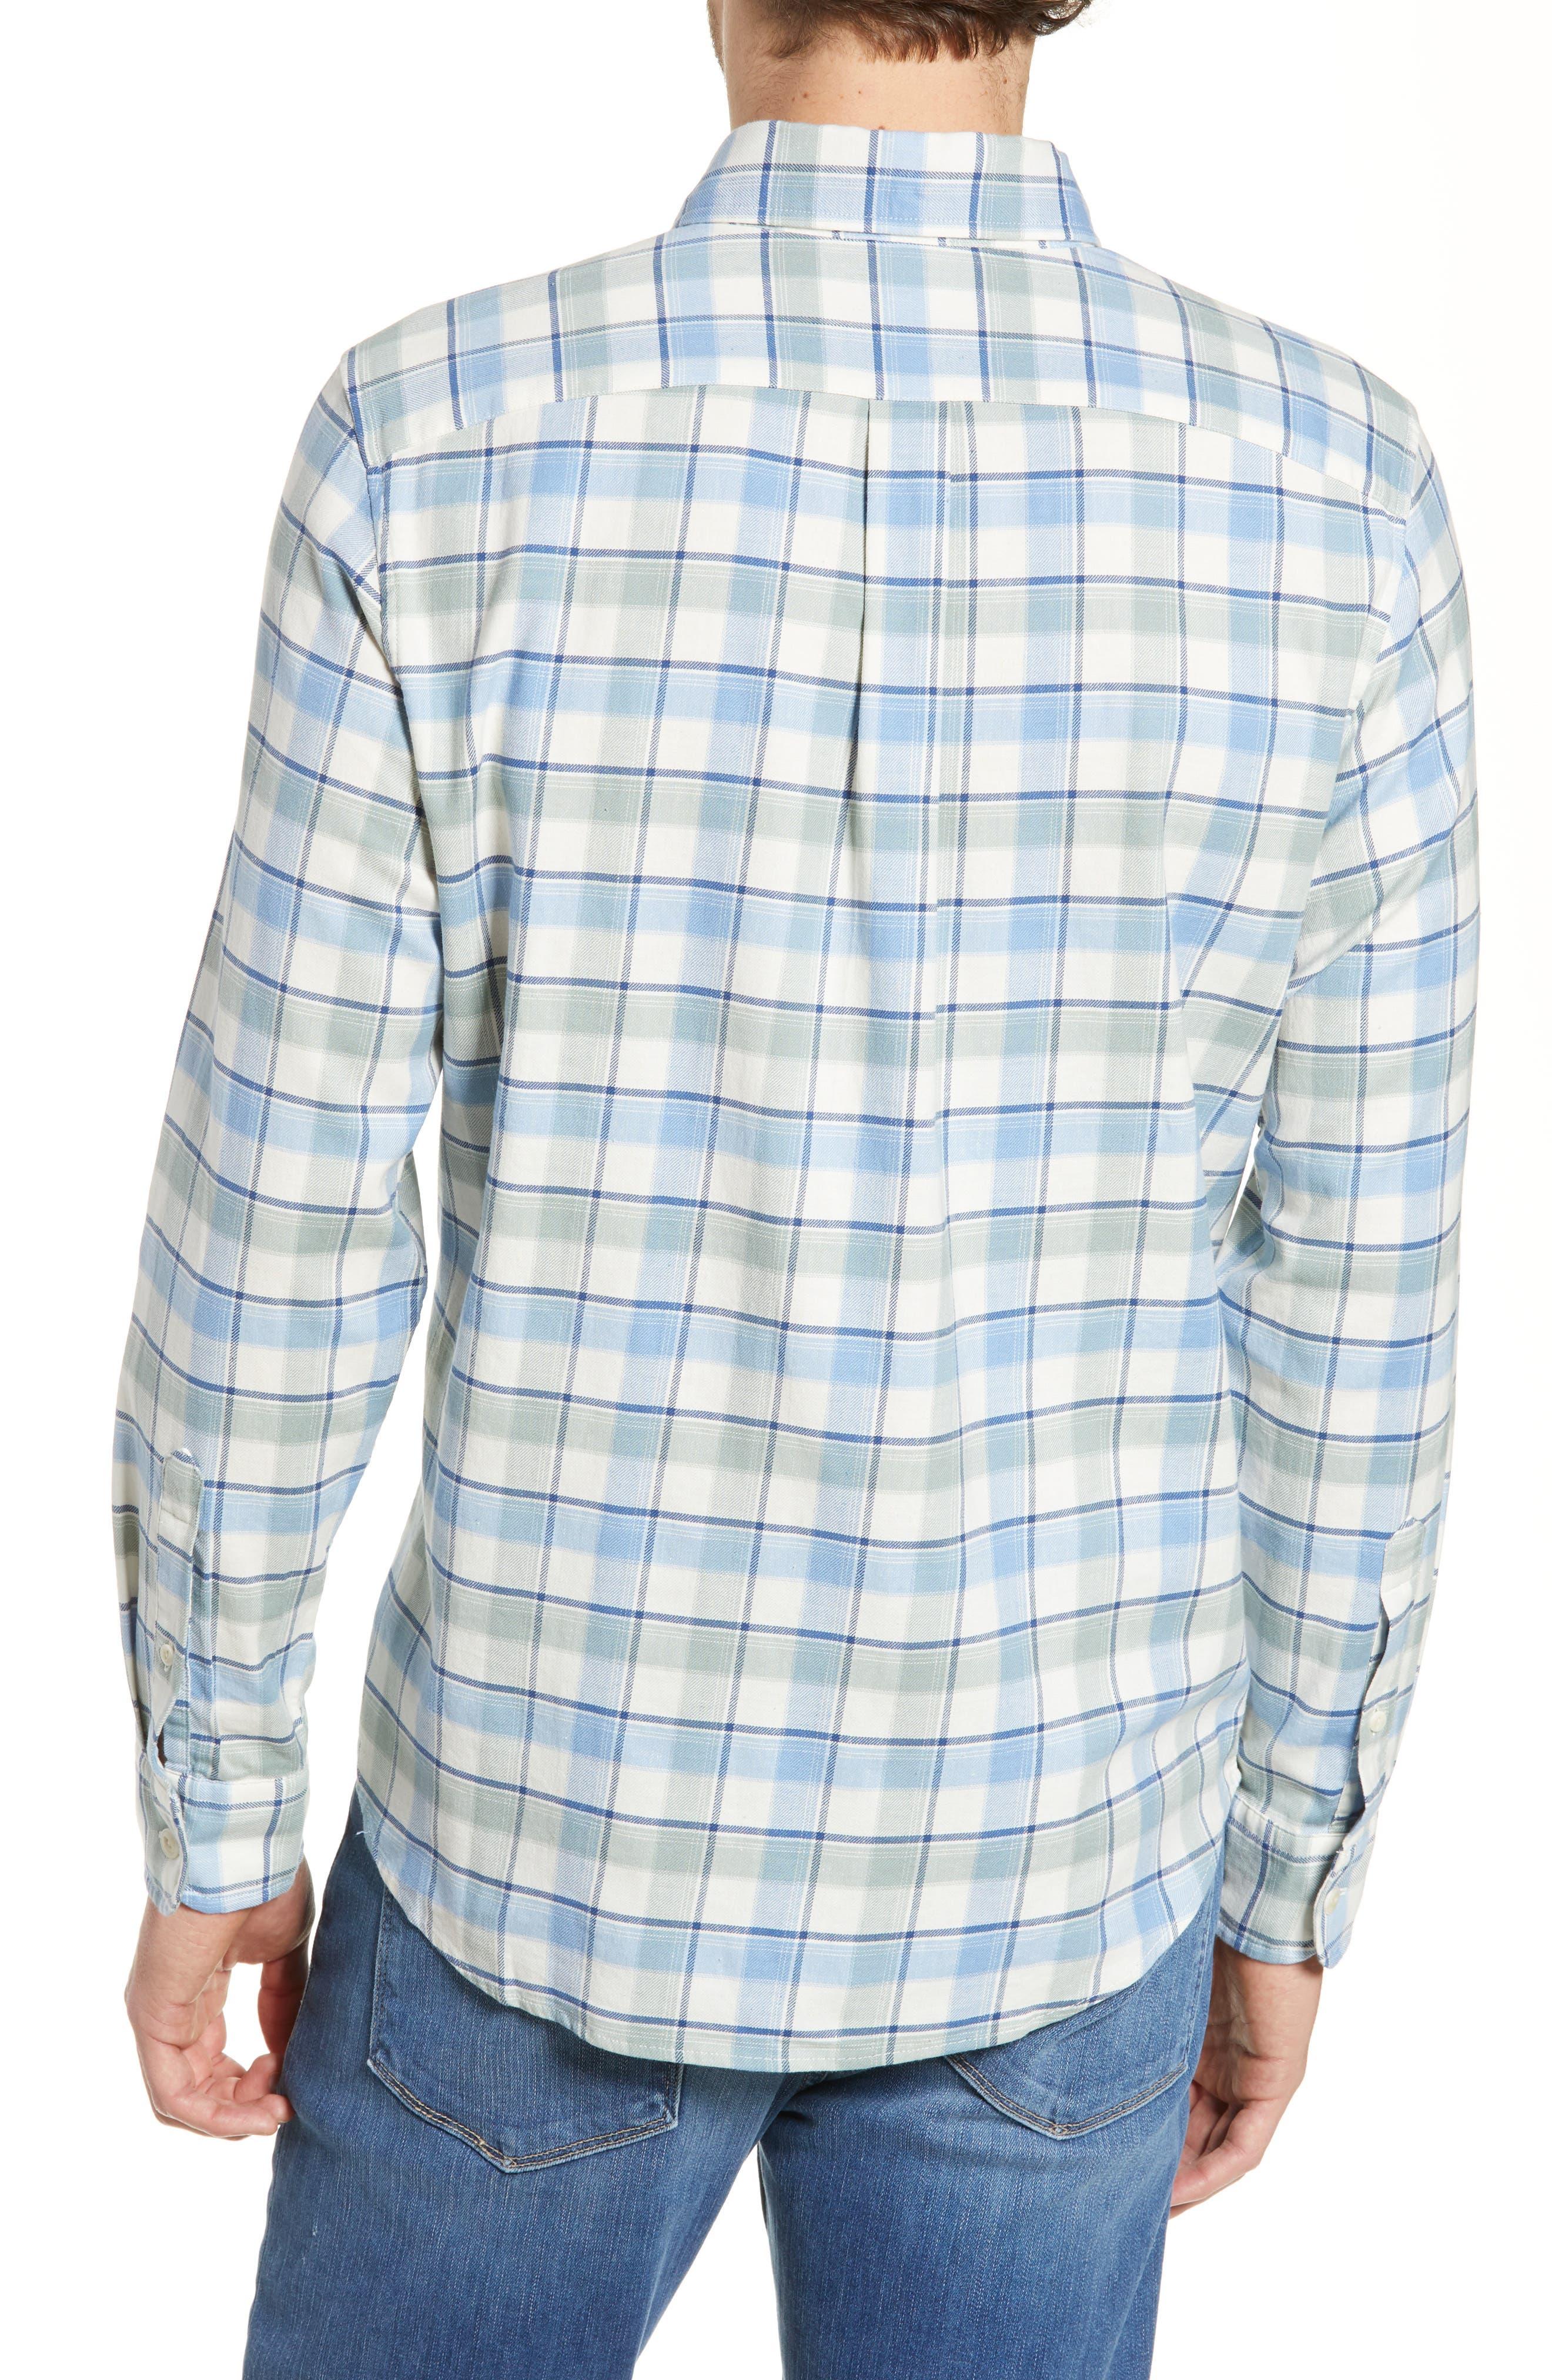 VINEYARD VINES,                             Bayside Slim Fit Plaid Sport Shirt,                             Alternate thumbnail 3, color,                             LIGHT SAGE